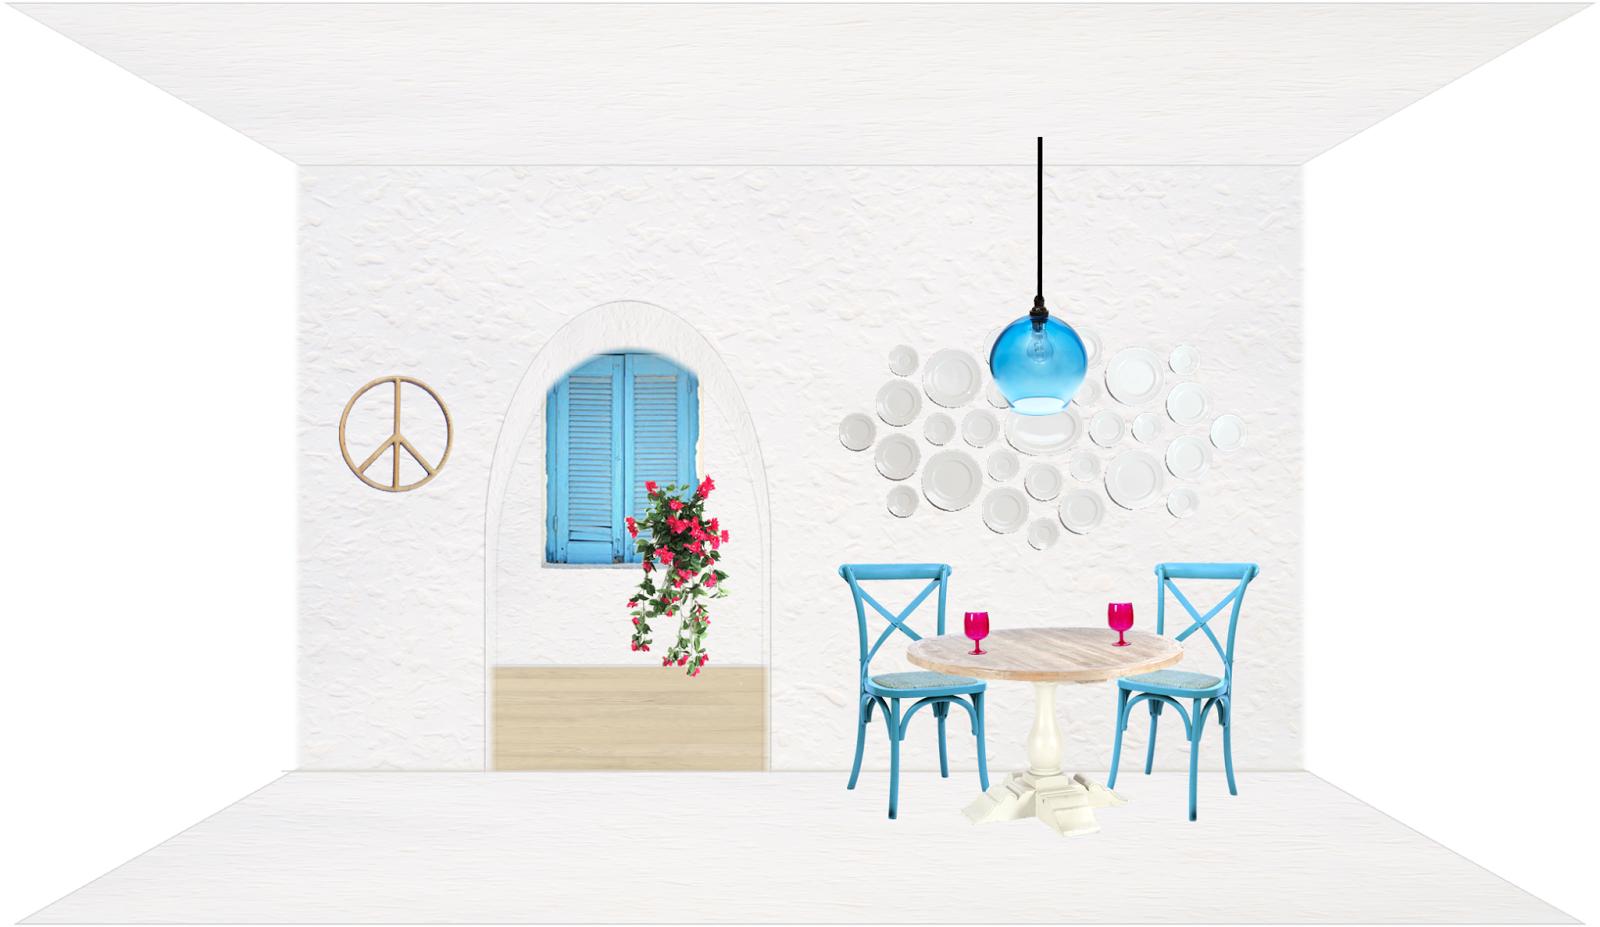 santorini inspired moodboard - greece - white - blue - decor